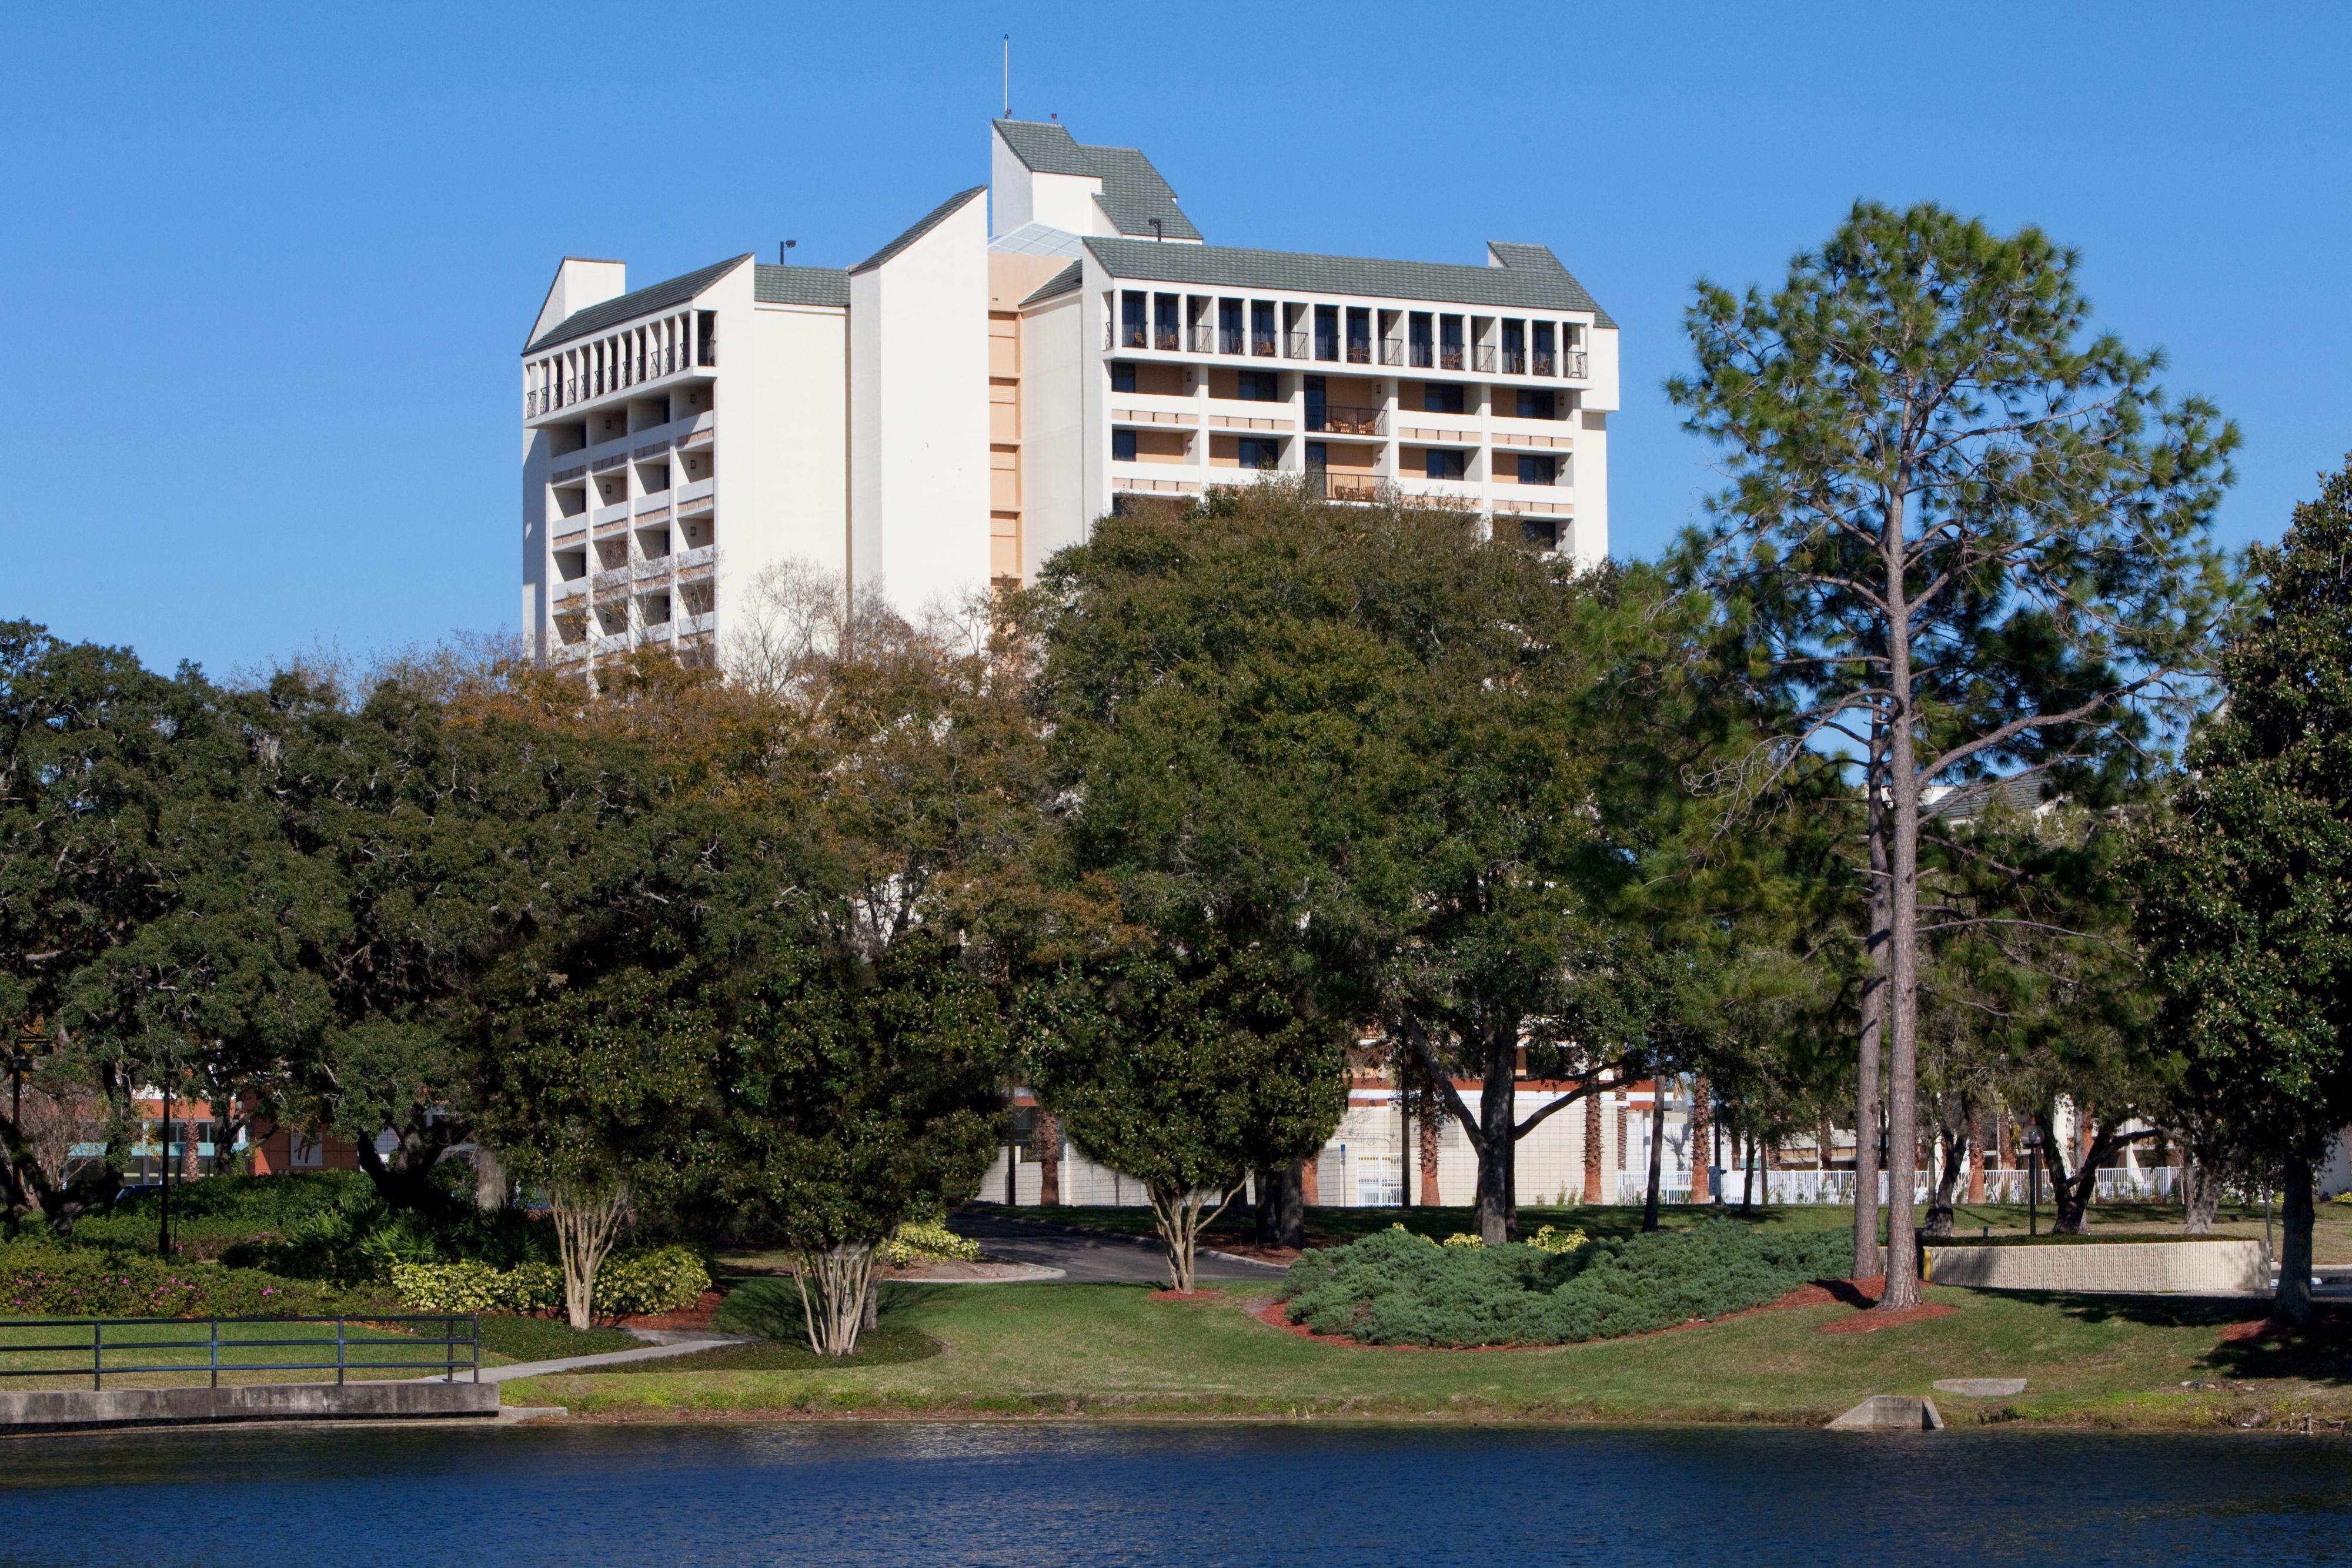 Holiday Inn Orlando Disney Spring 174 Area At 1805 Hotel